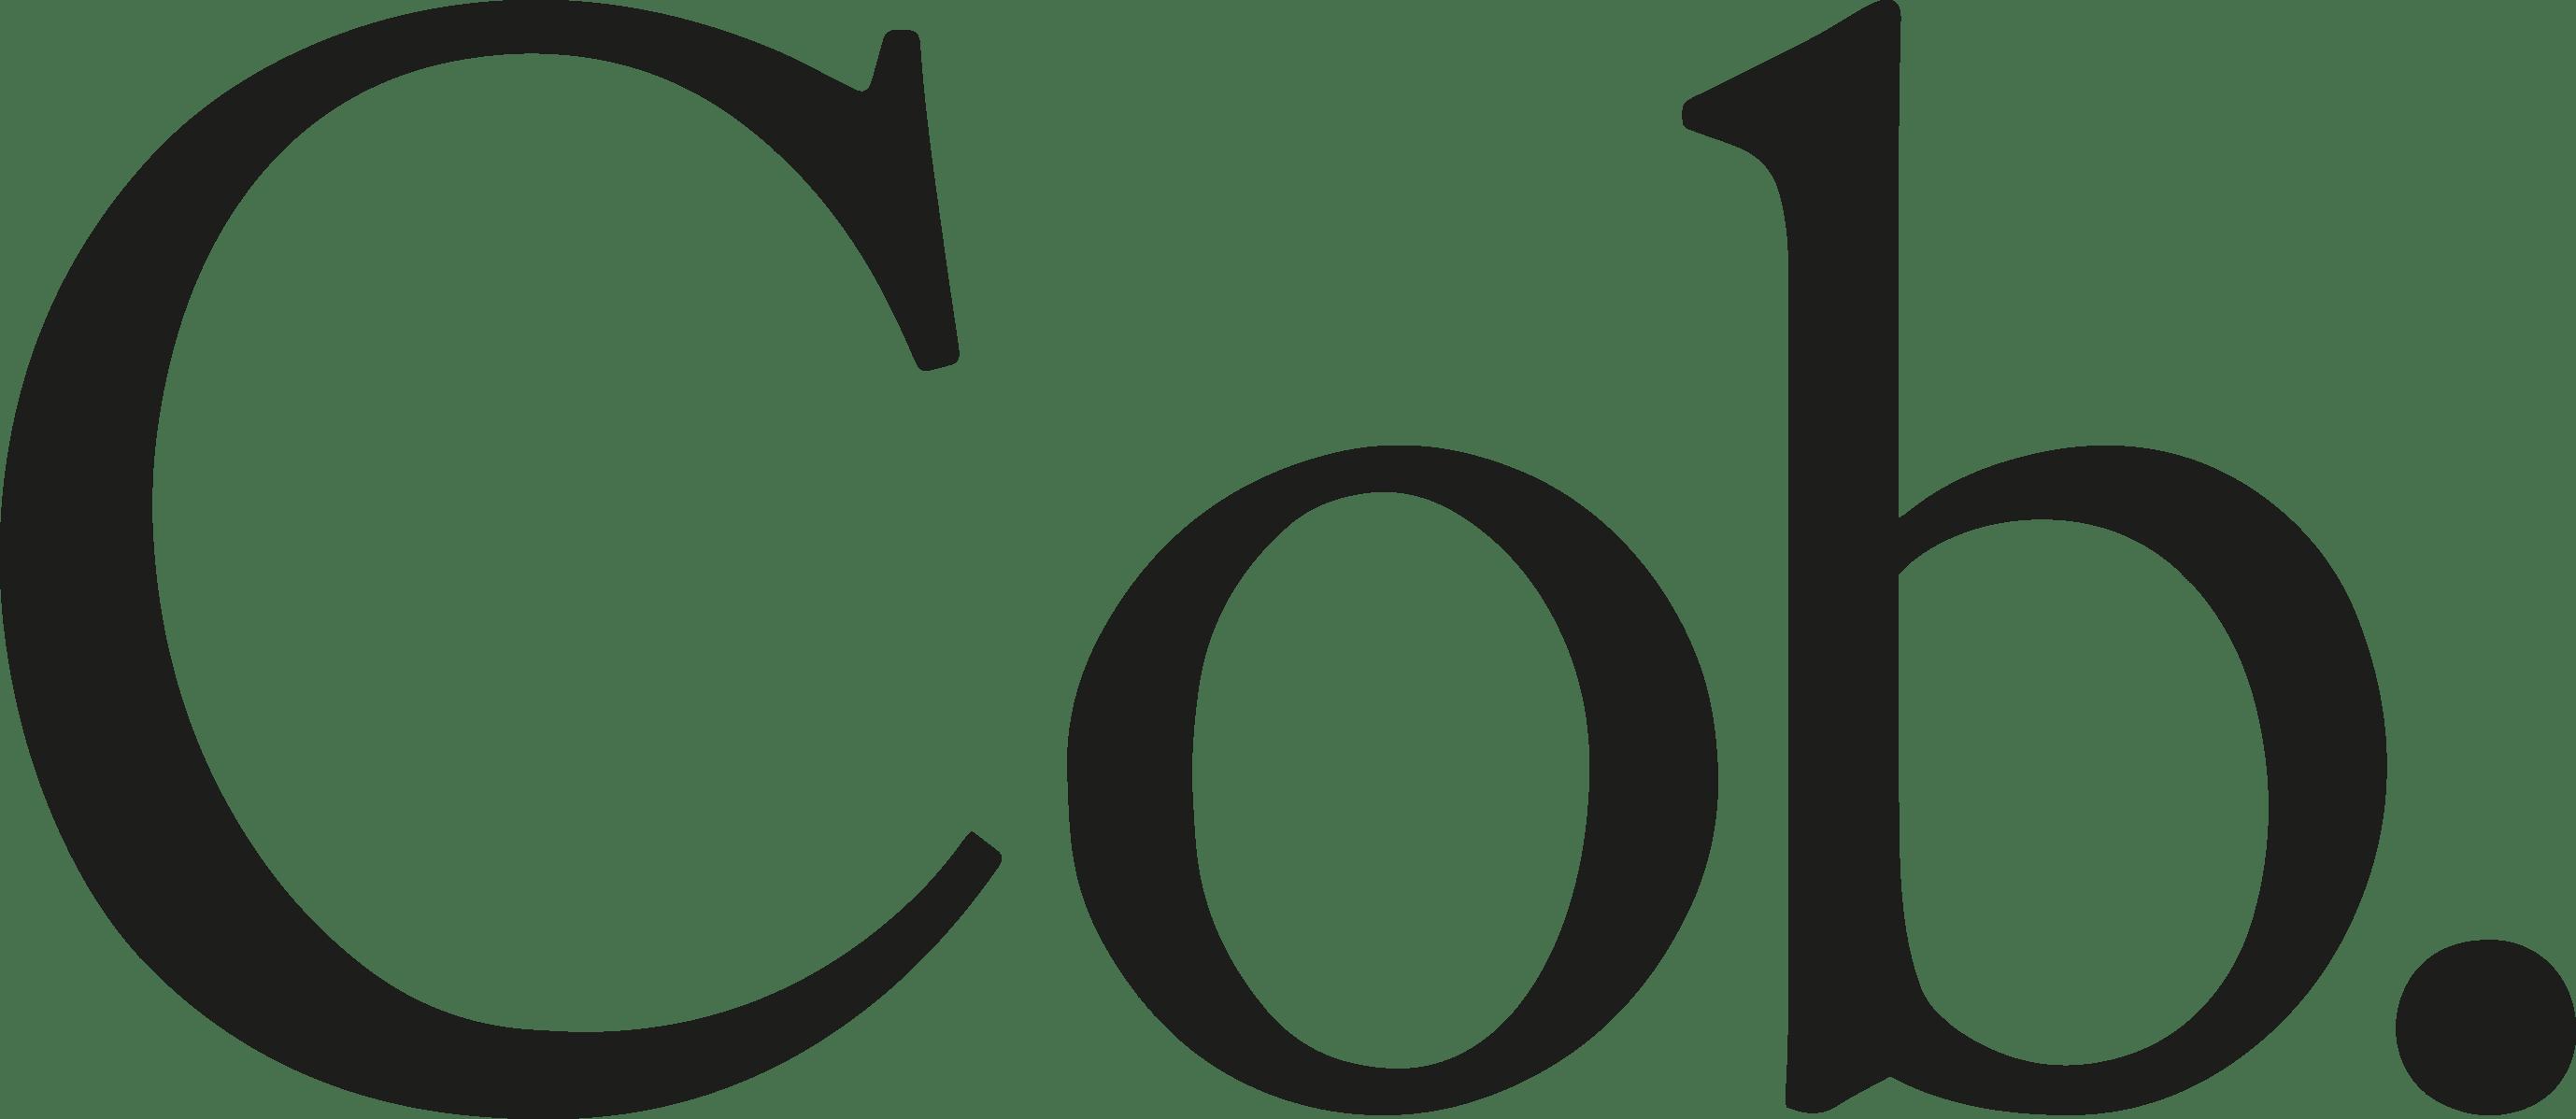 Cob Gallery company logo